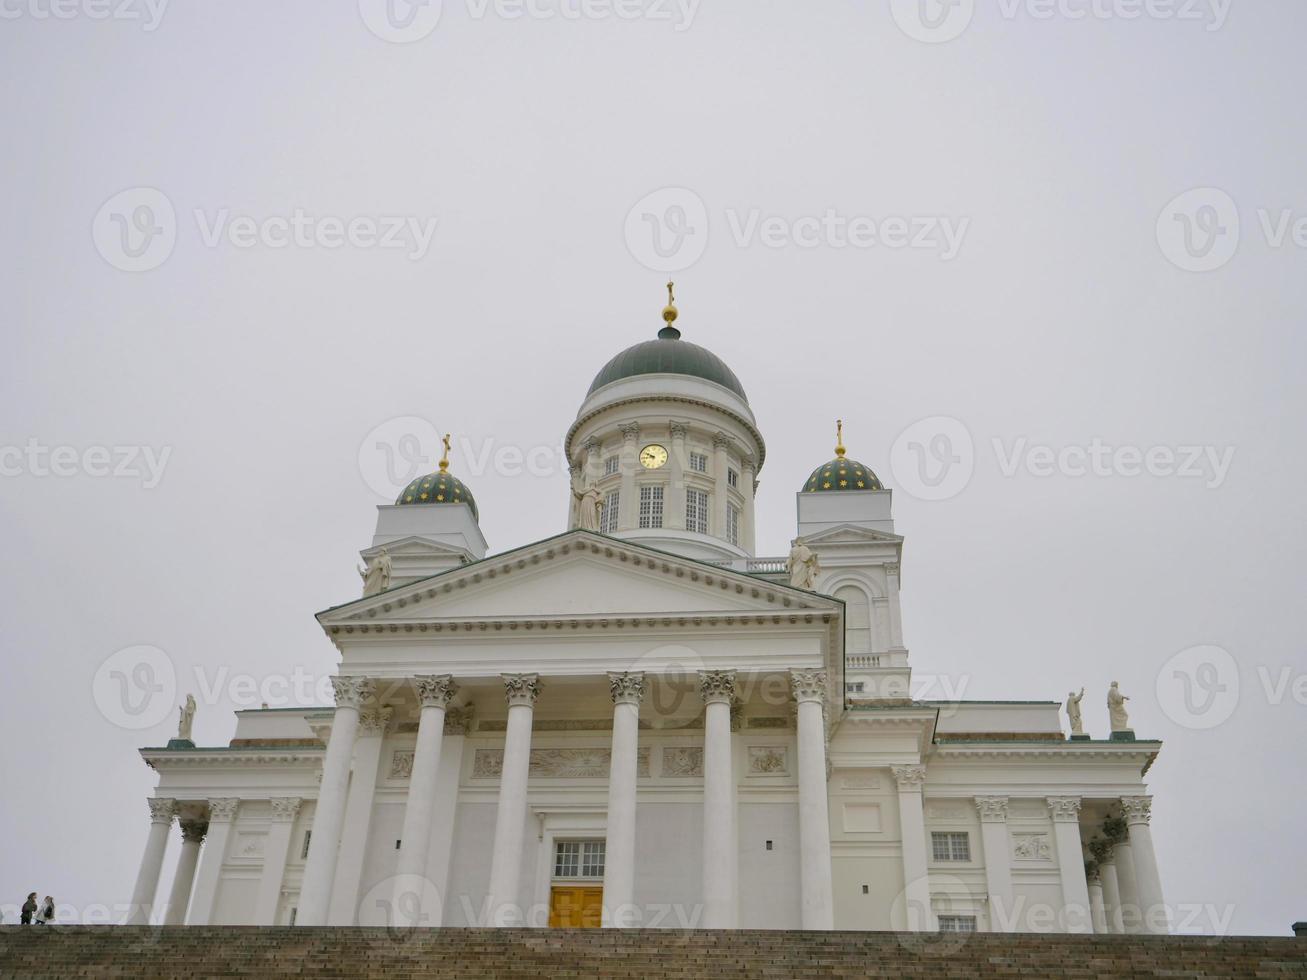 famoso lugar de viaje helsingin tuomiokirkko en helsinki, finlandia foto